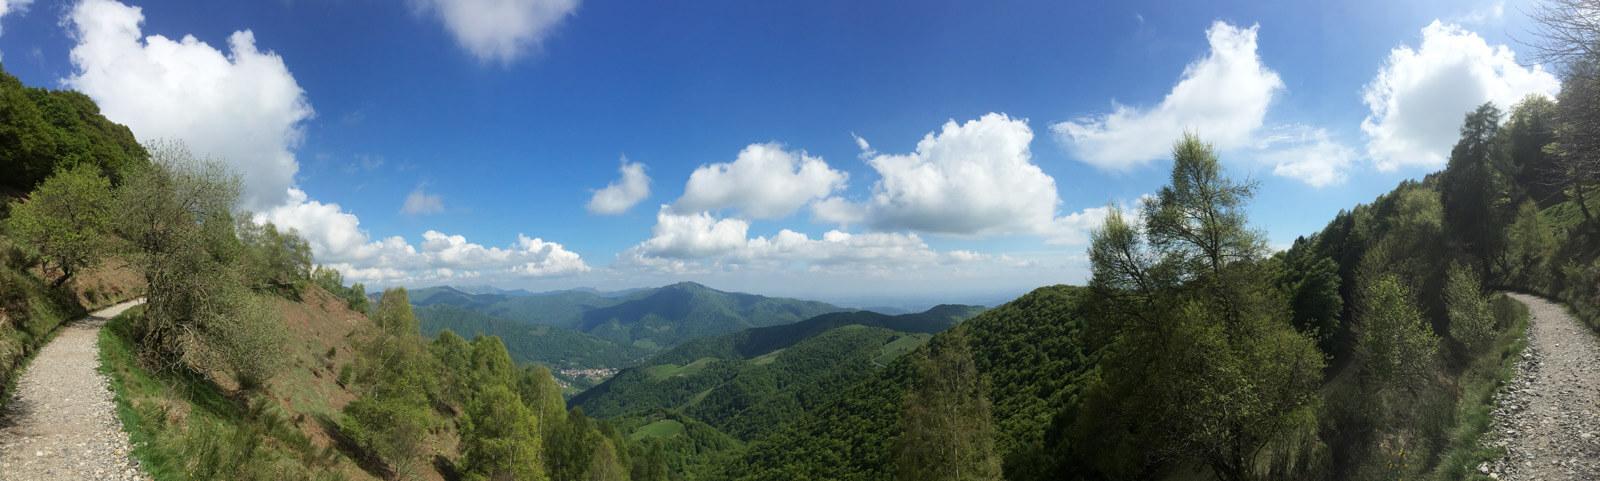 Monte Generoso Ticino - Amazing Panorama